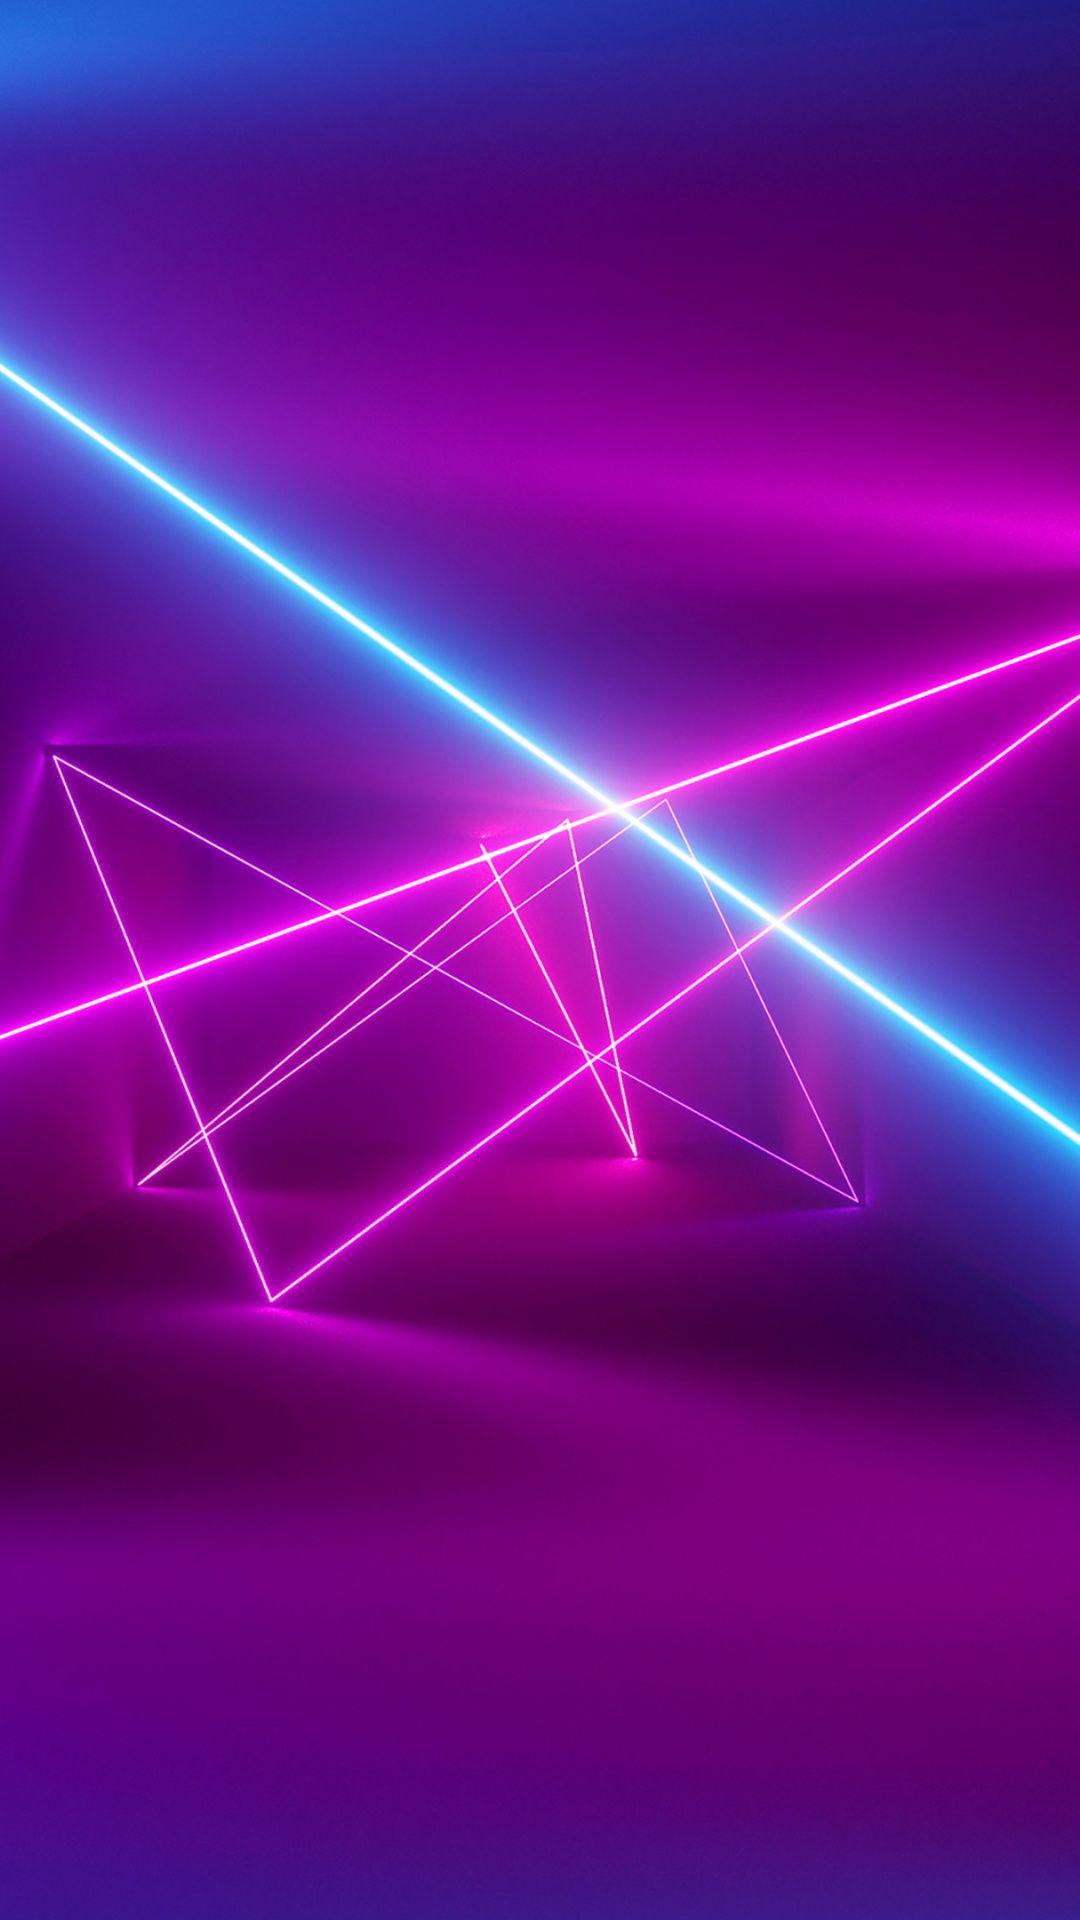 1080x1920 Lights Blue Pink Laser Lights Neon Barrier Abstraction Wallpaper Neon Light Wallpaper Neon Wallpaper Wallpaper Pink And Blue